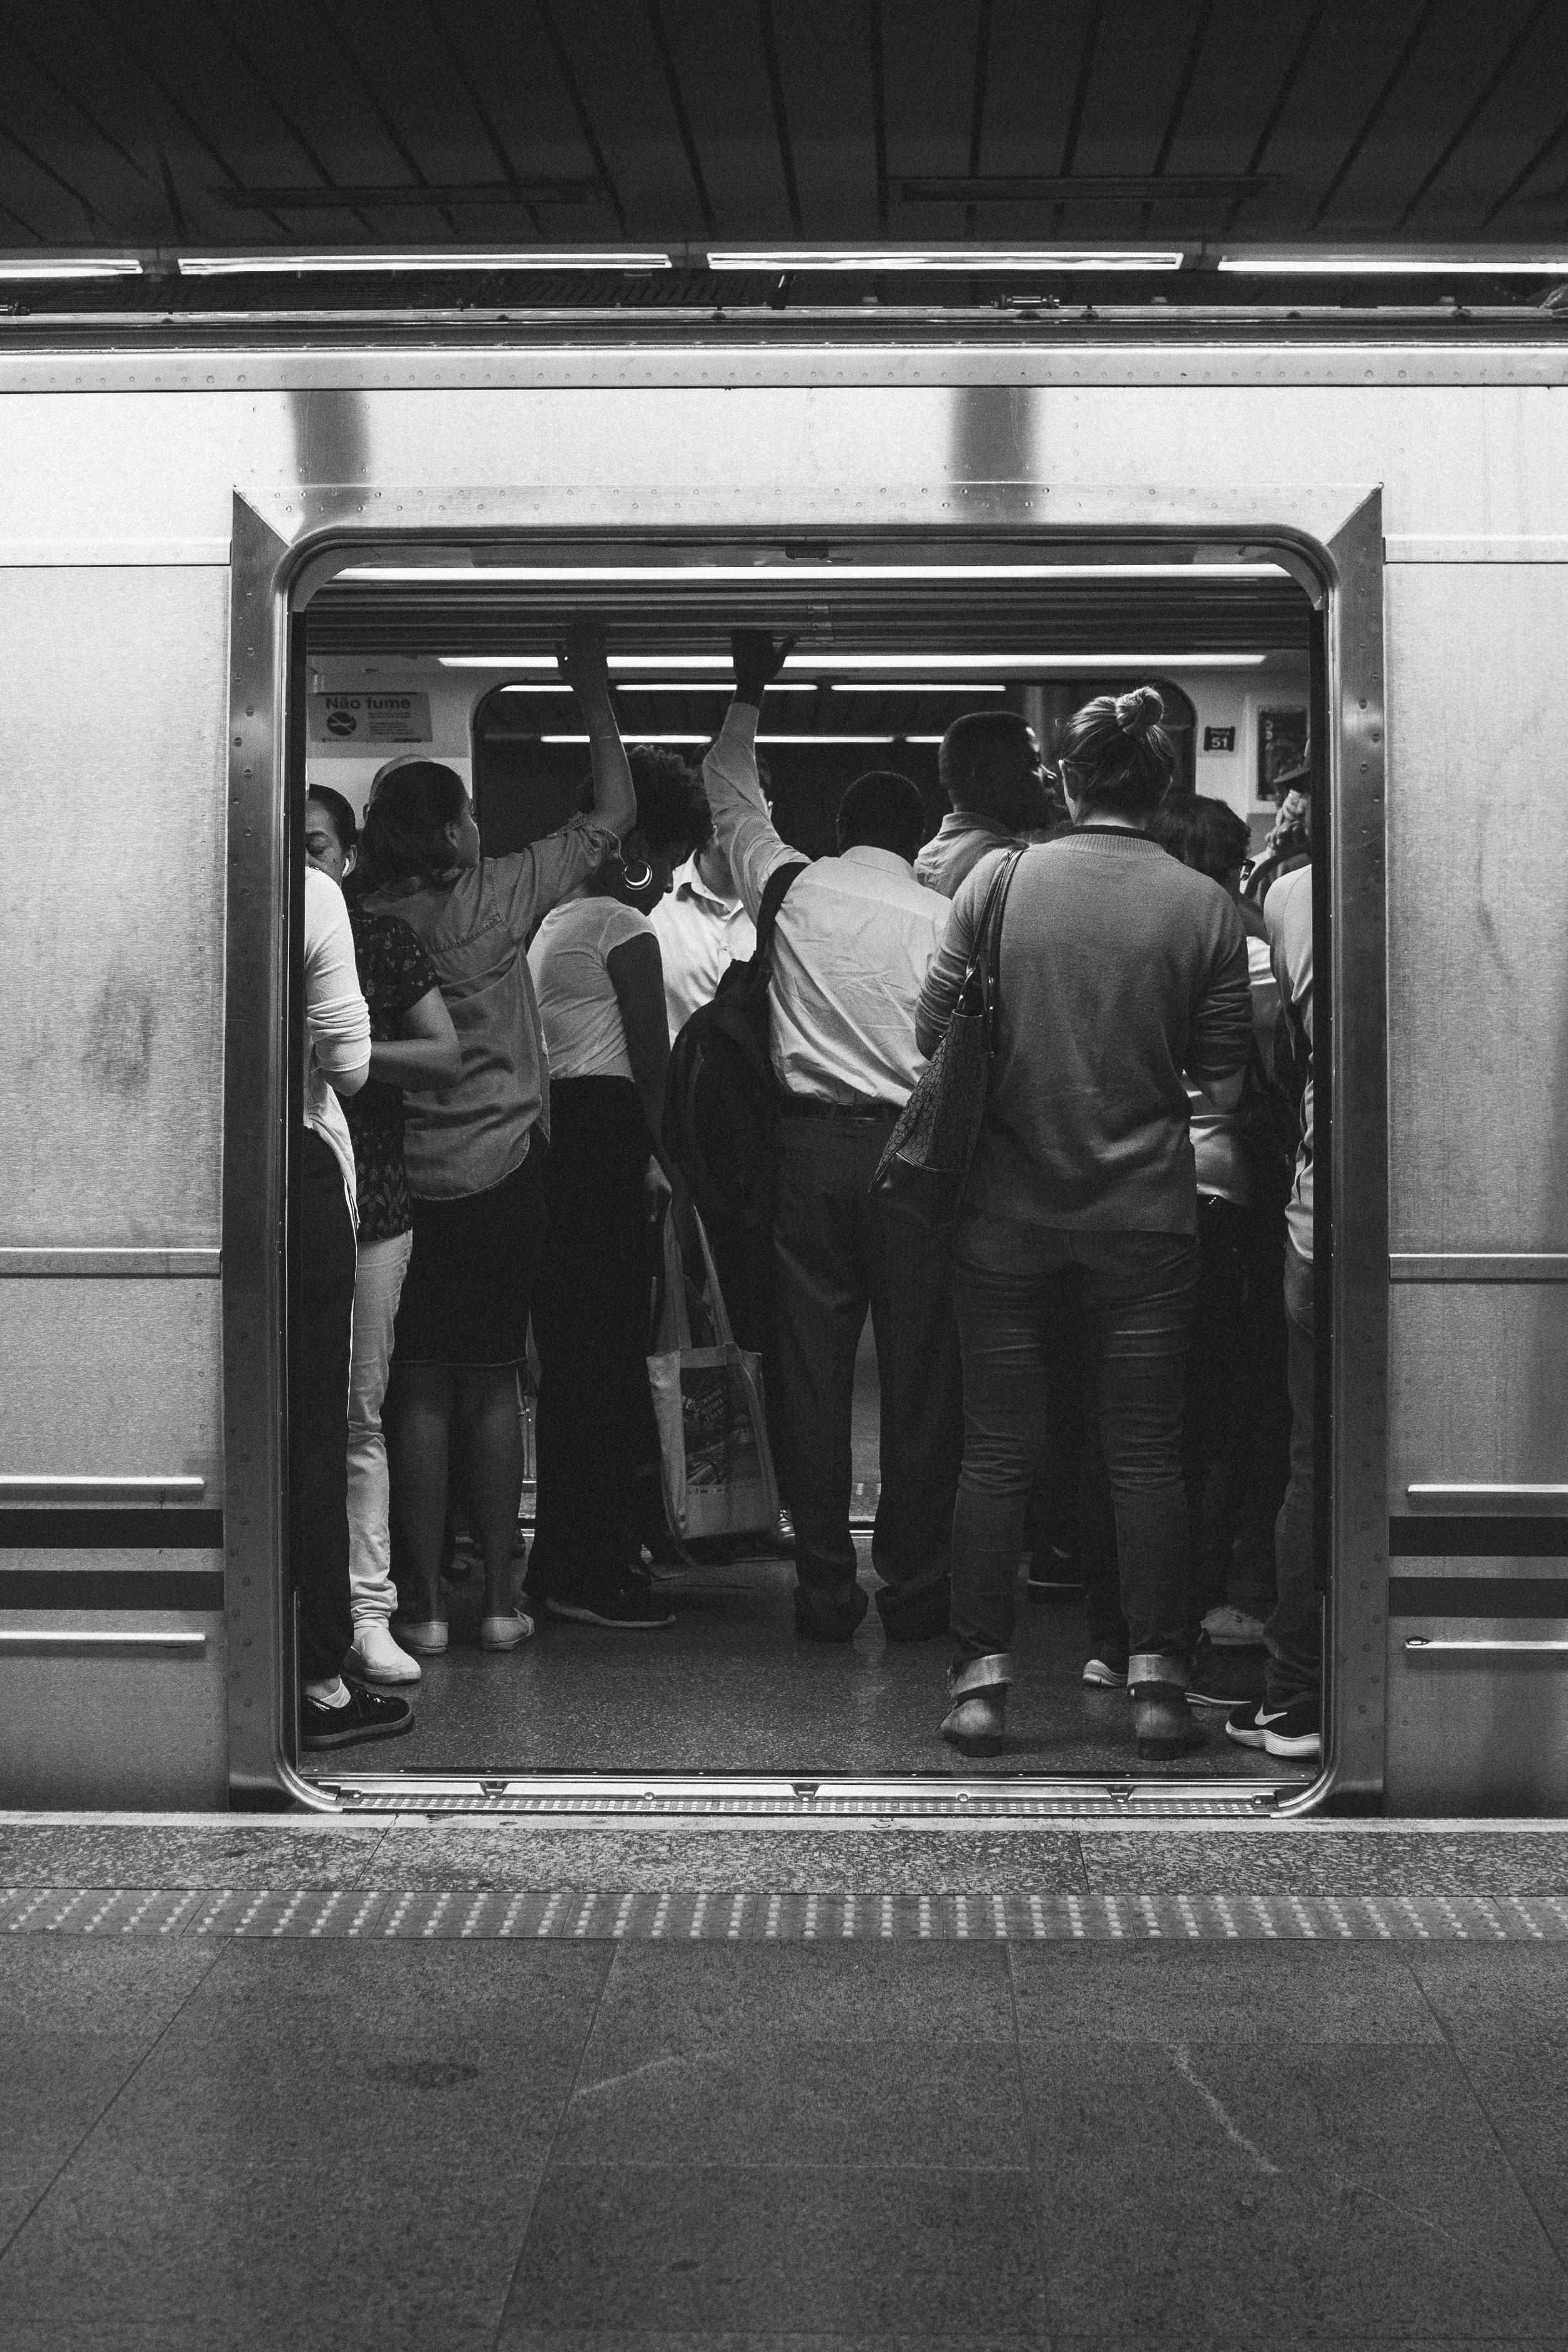 adults-city-crowded-1970283.jpg